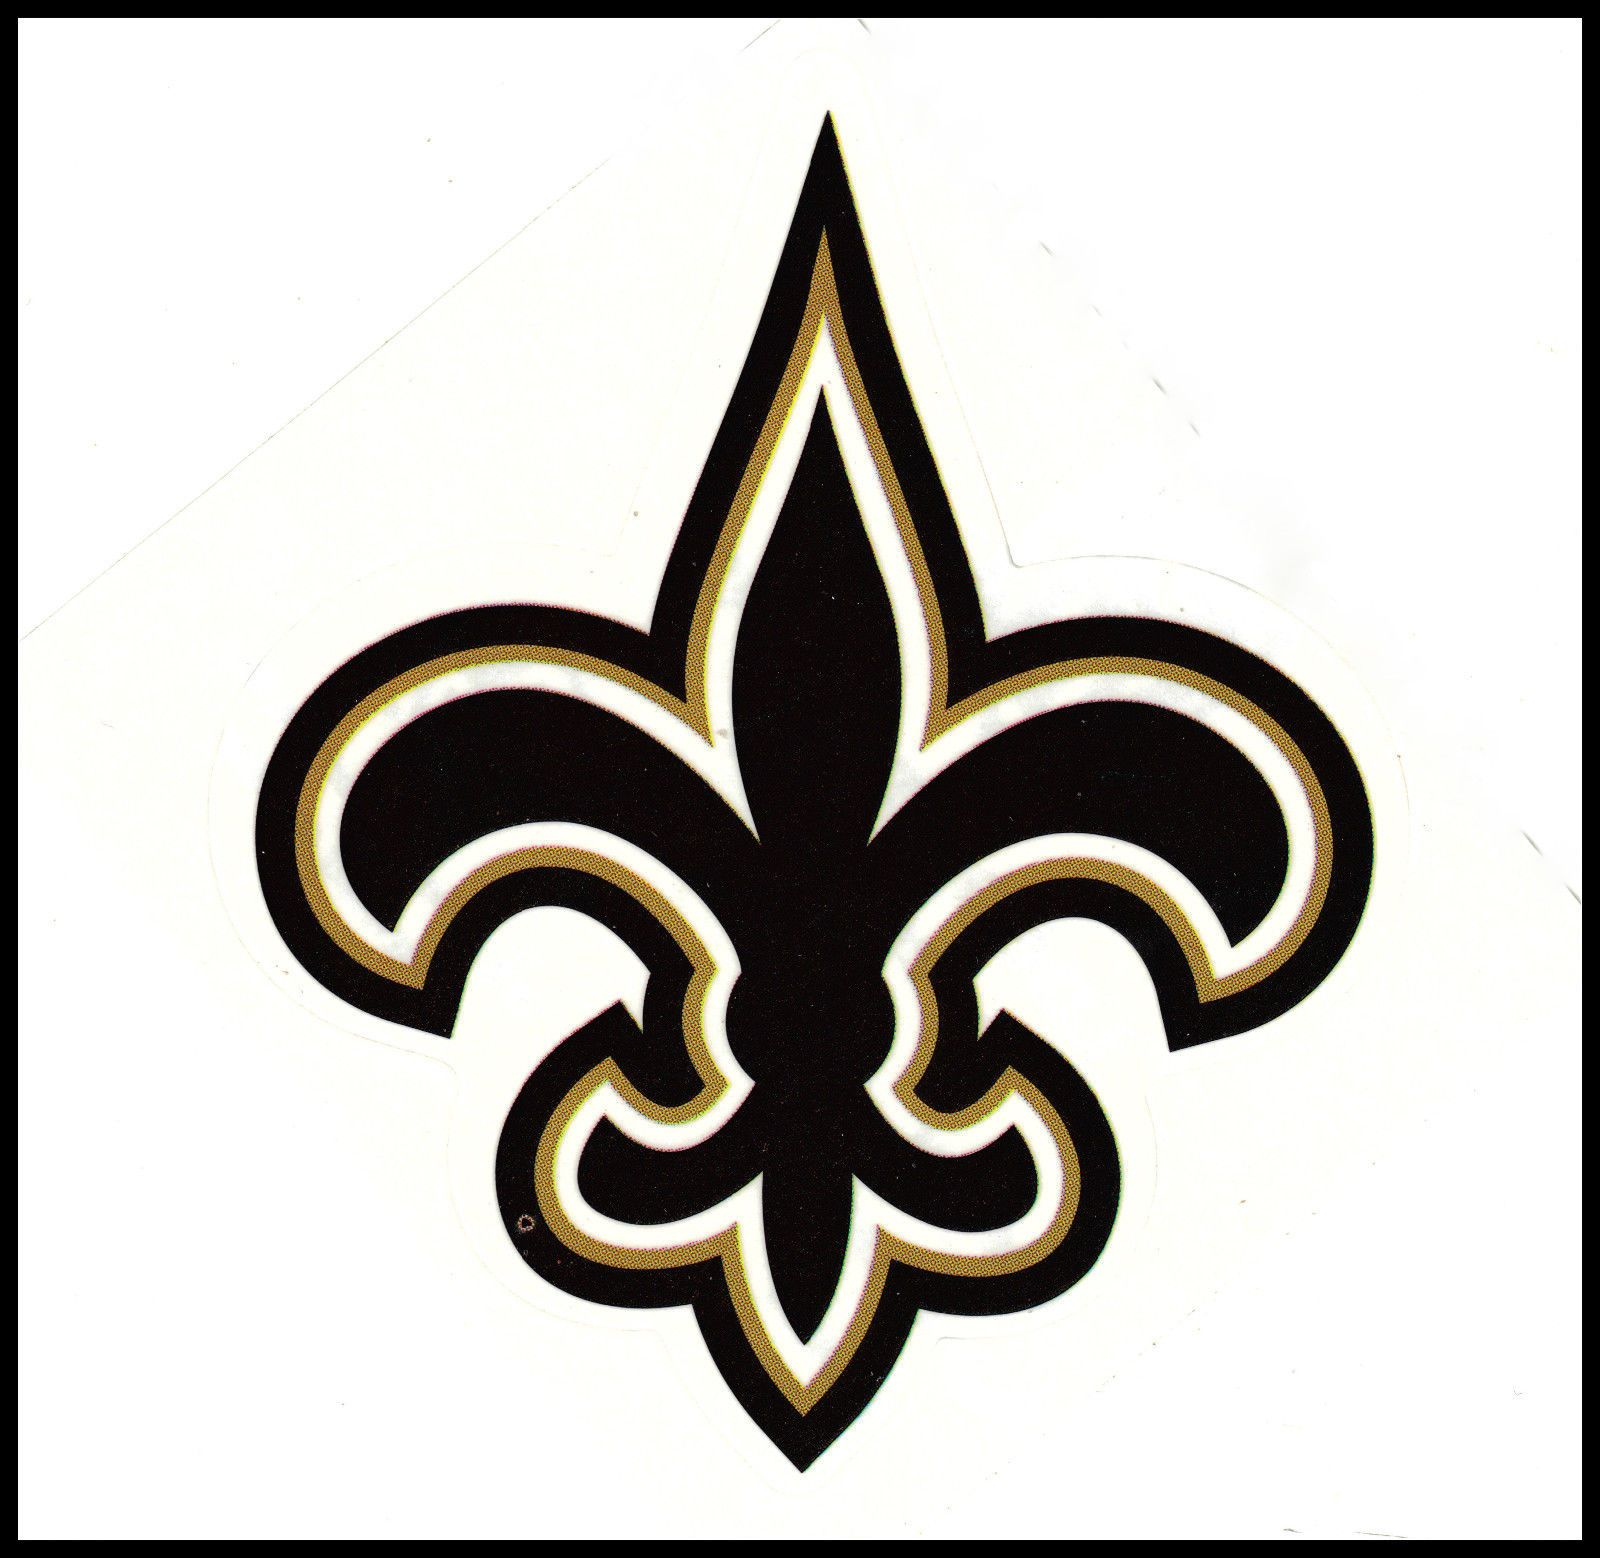 New Orleans Saints Football Nfl Team Logo Design Decal Sticker Bogo 25 Off Ebay New Orleans Saints Logo New Orleans Saints Nfl Teams Logos [ 1558 x 1600 Pixel ]